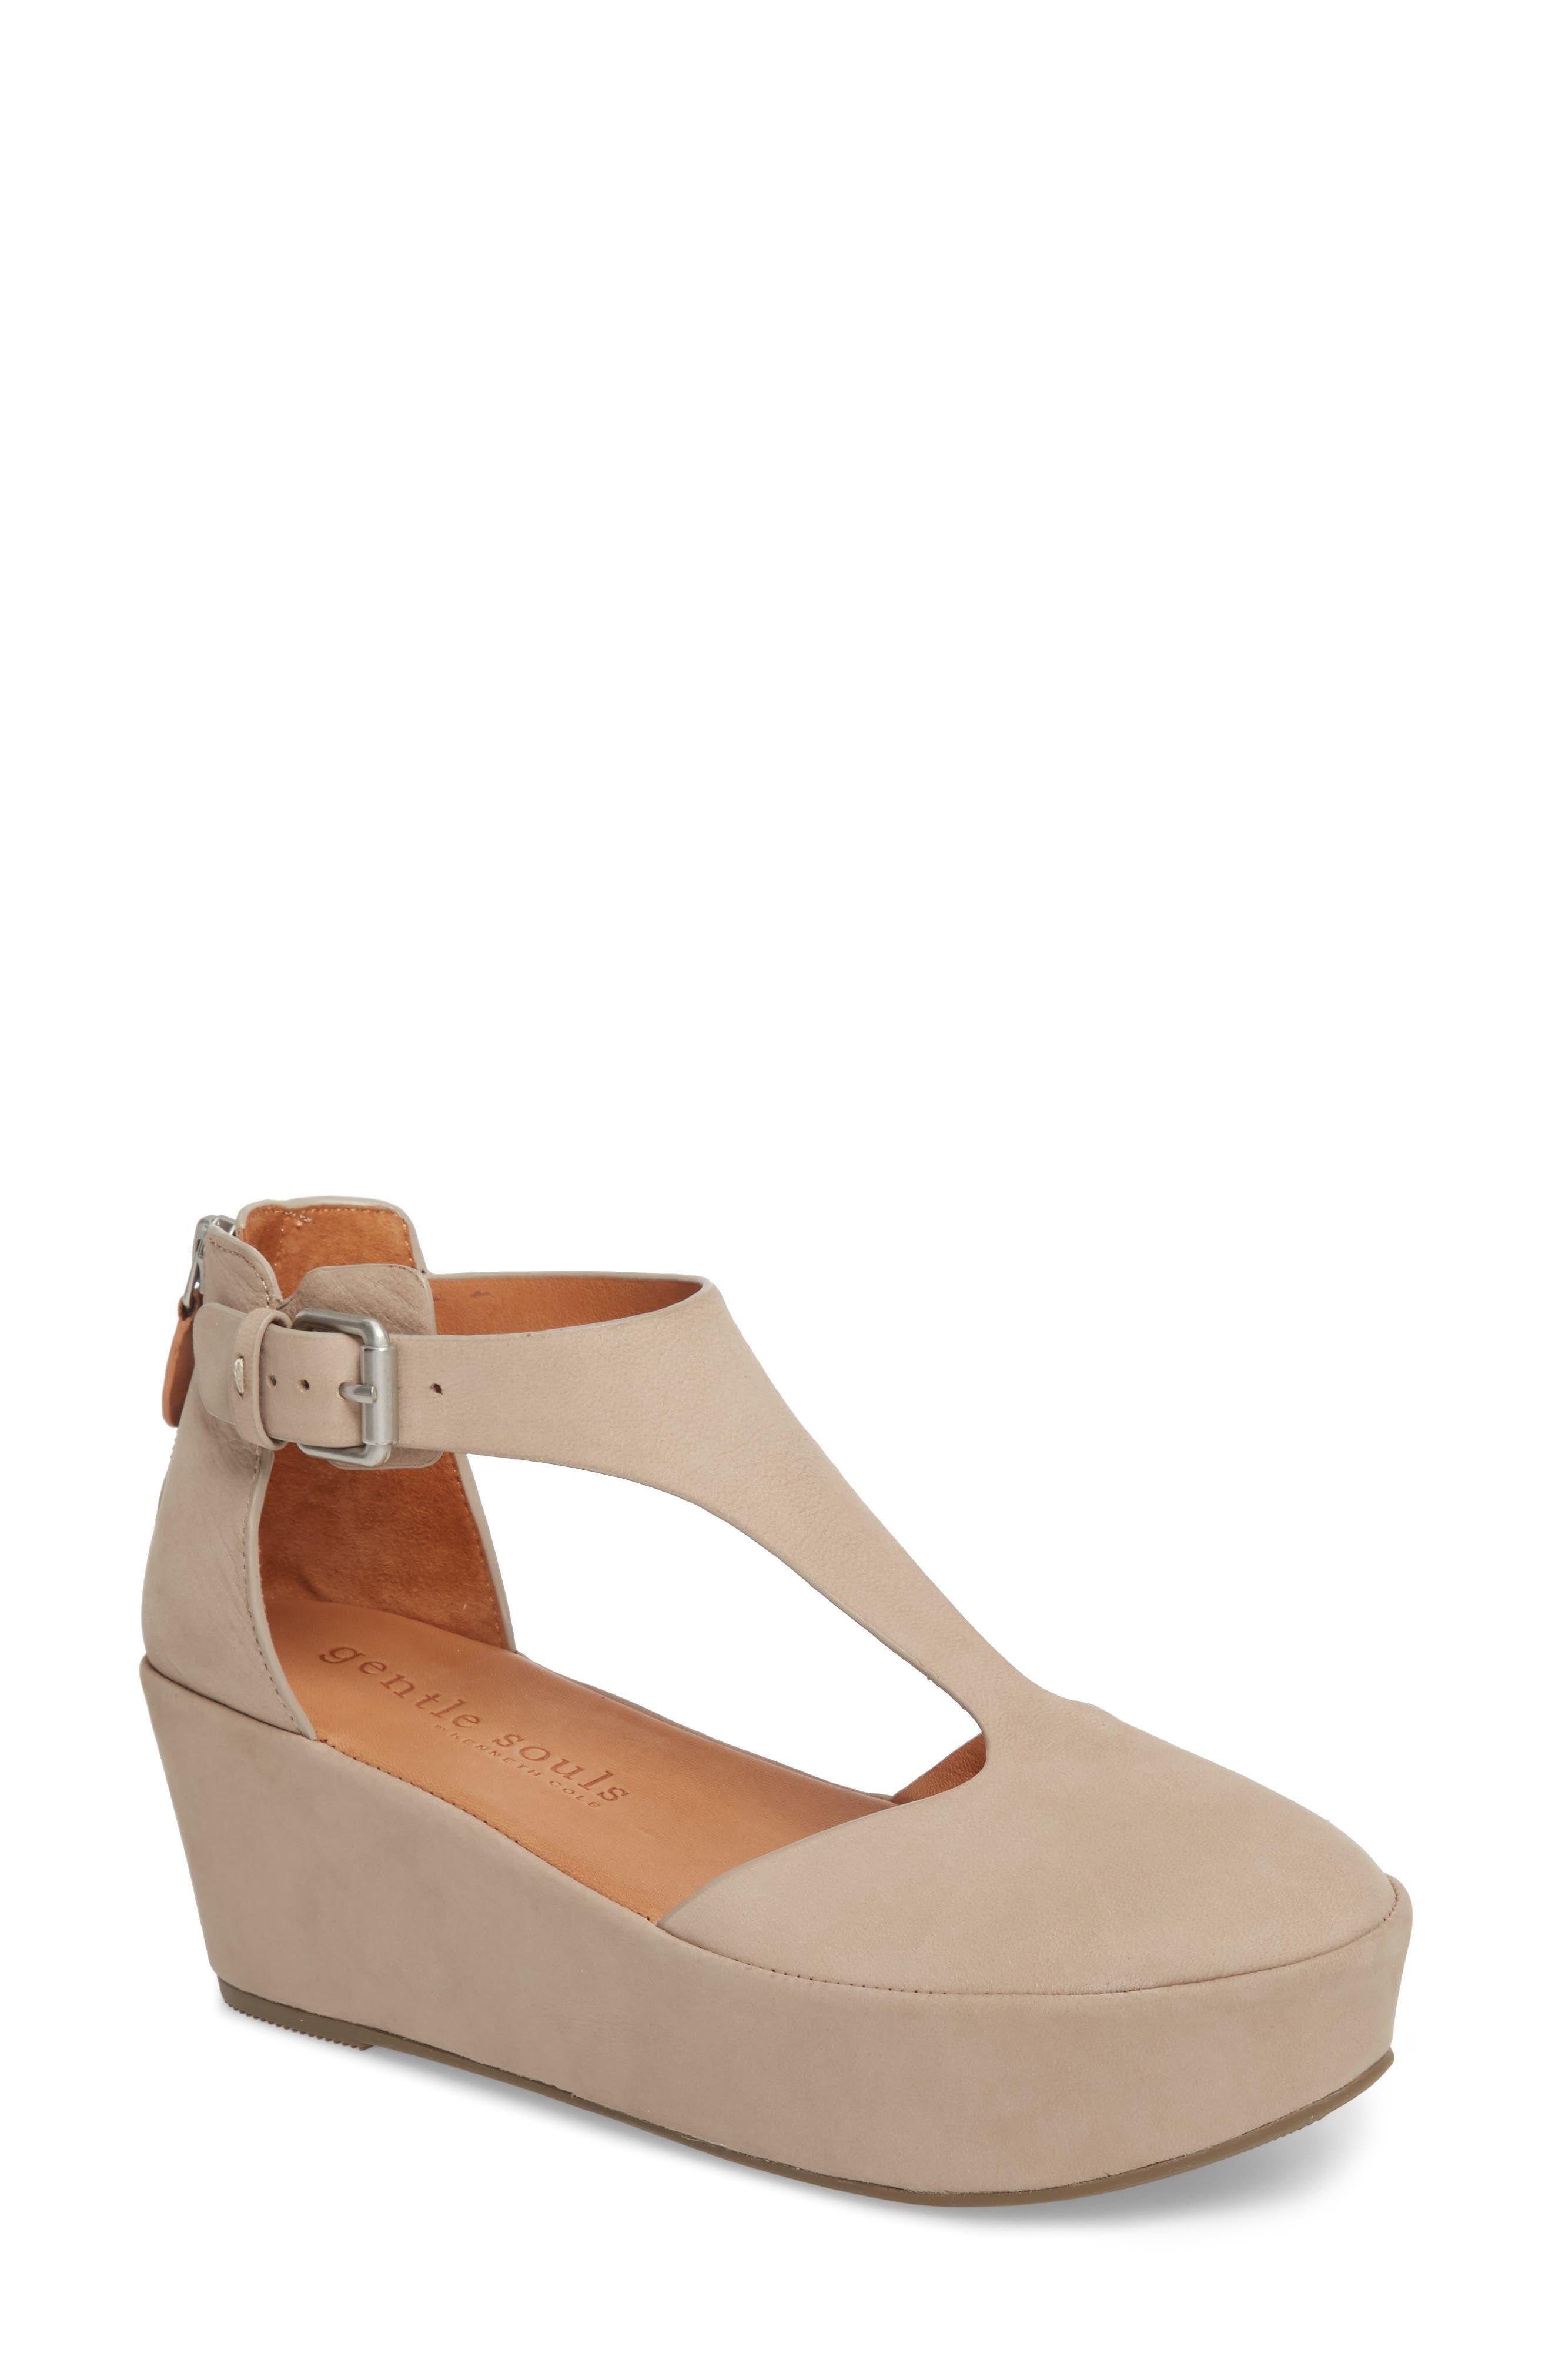 GENTLE SOULS BY KENNETH COLE Nydia Platform Sandal, Main, color, MUSHROOM NUBUCK